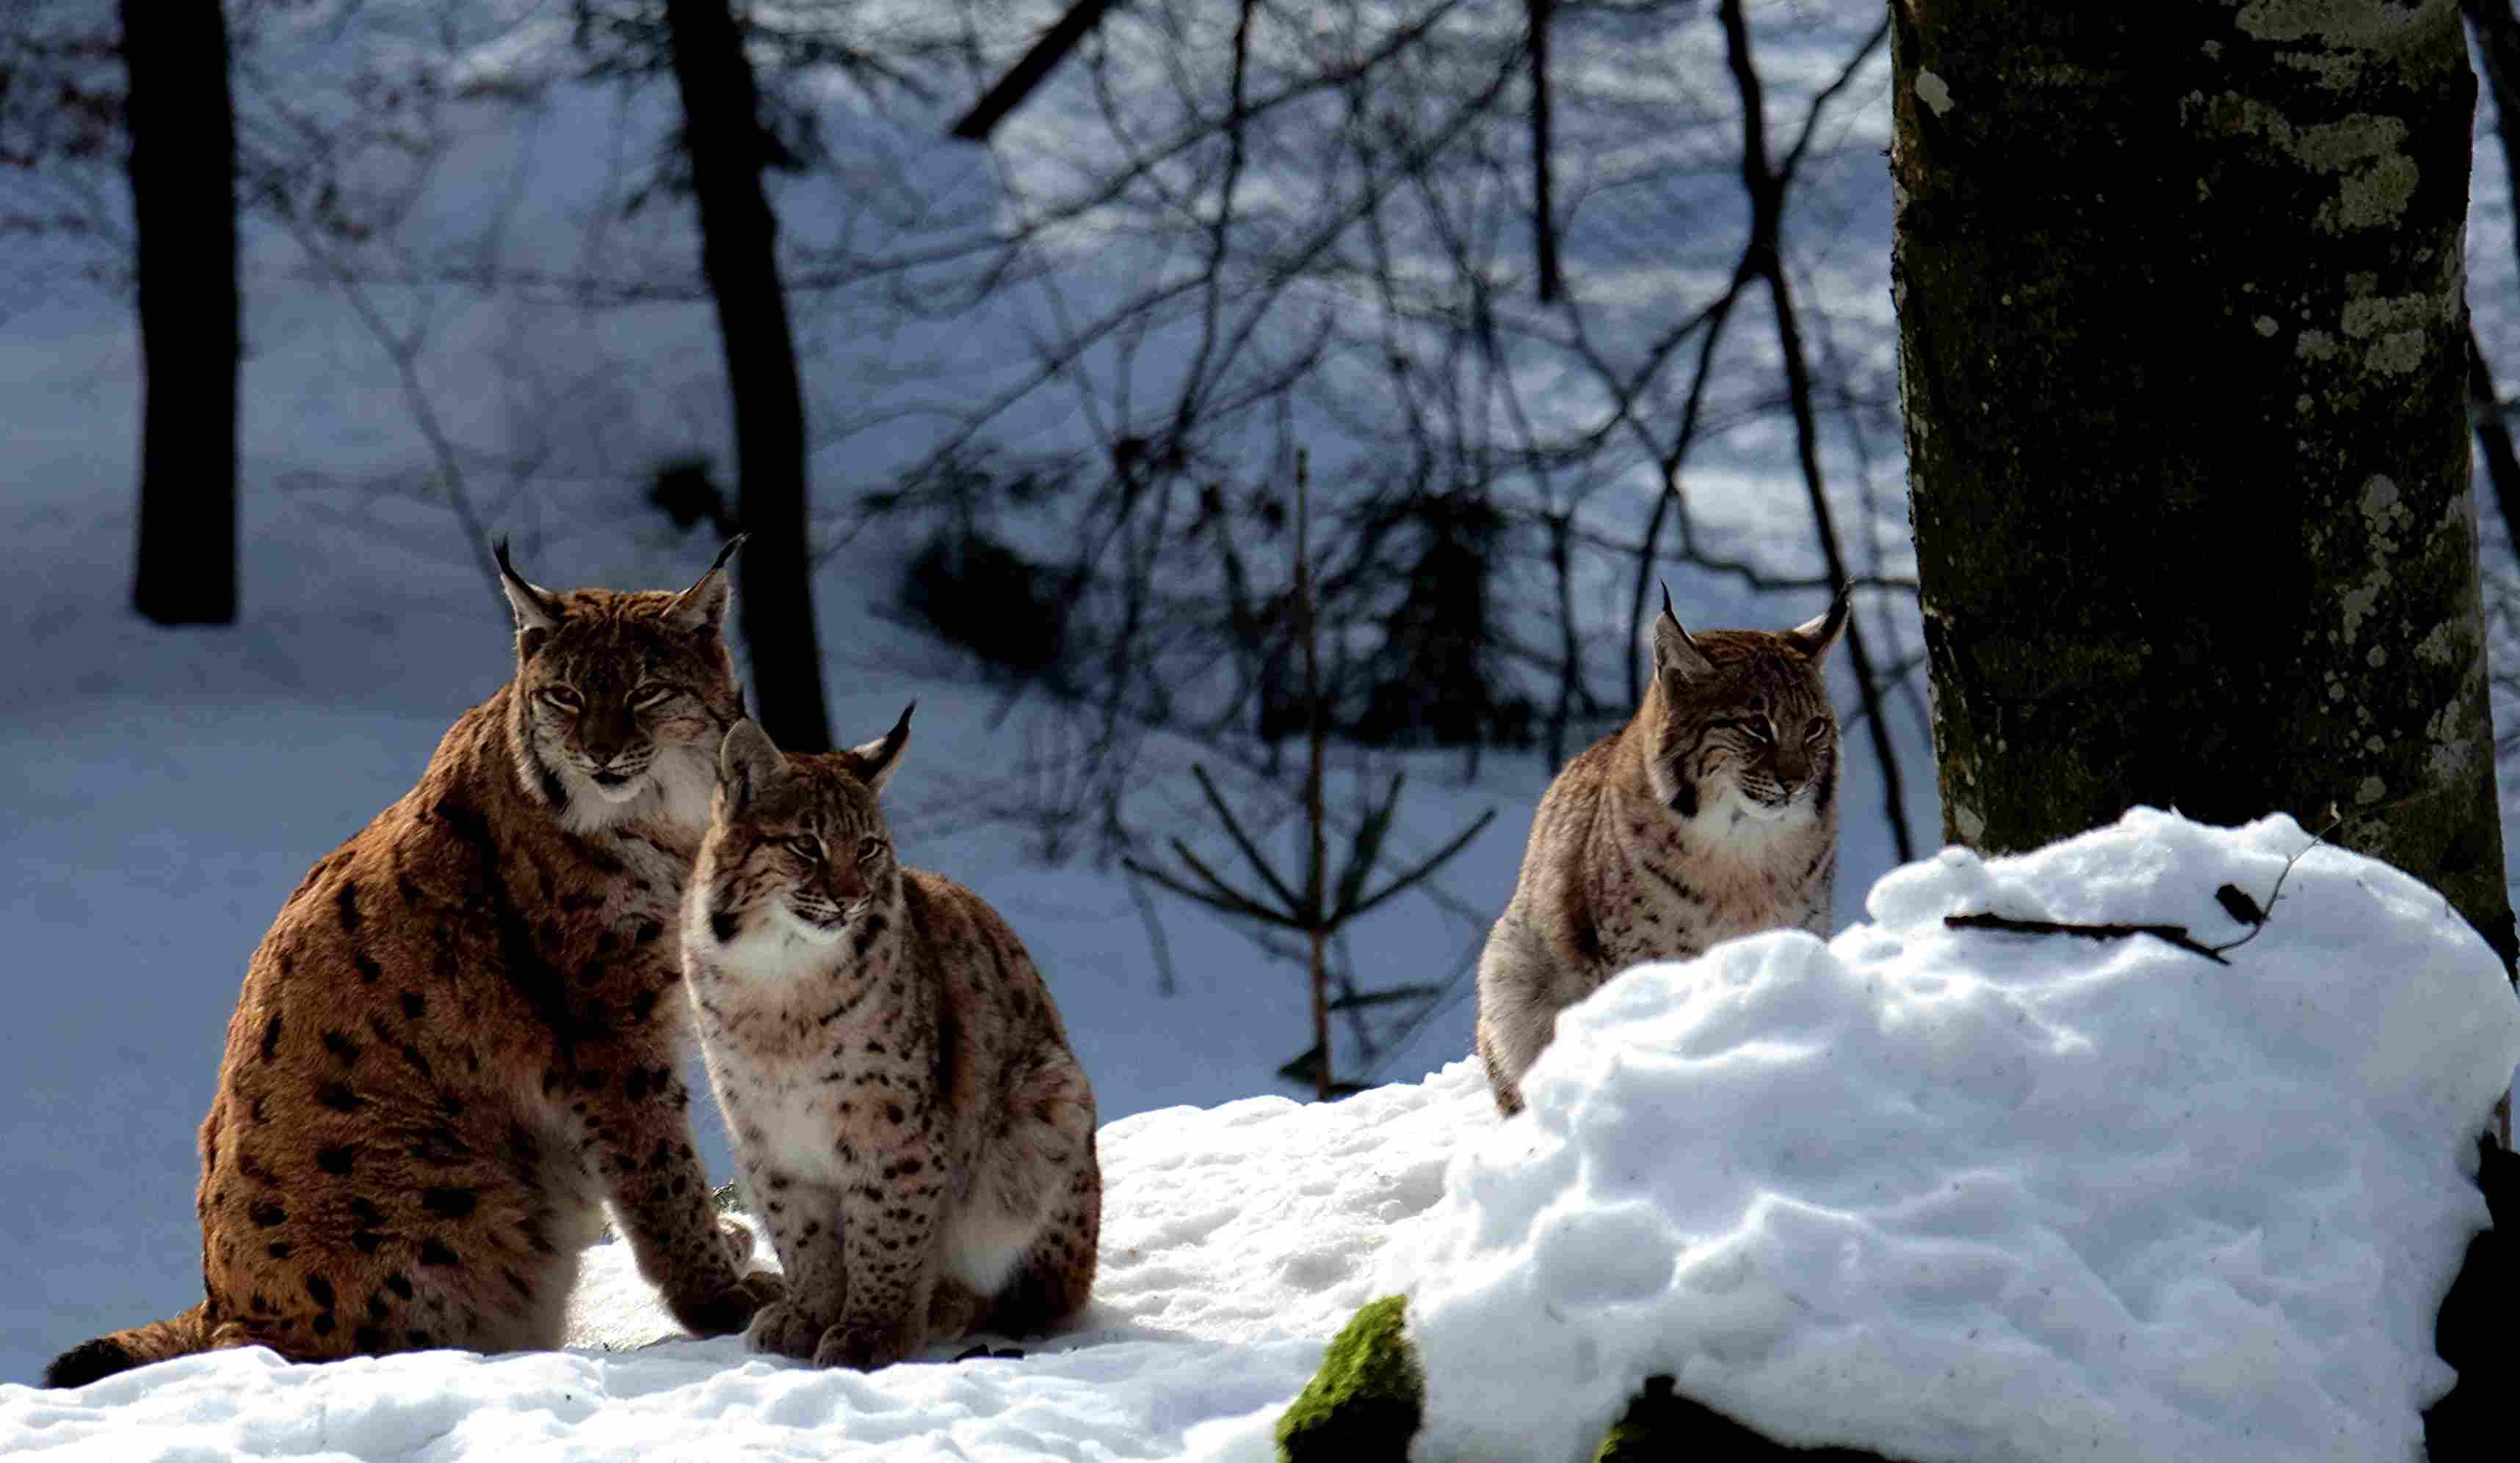 Three bobcats in the snow.